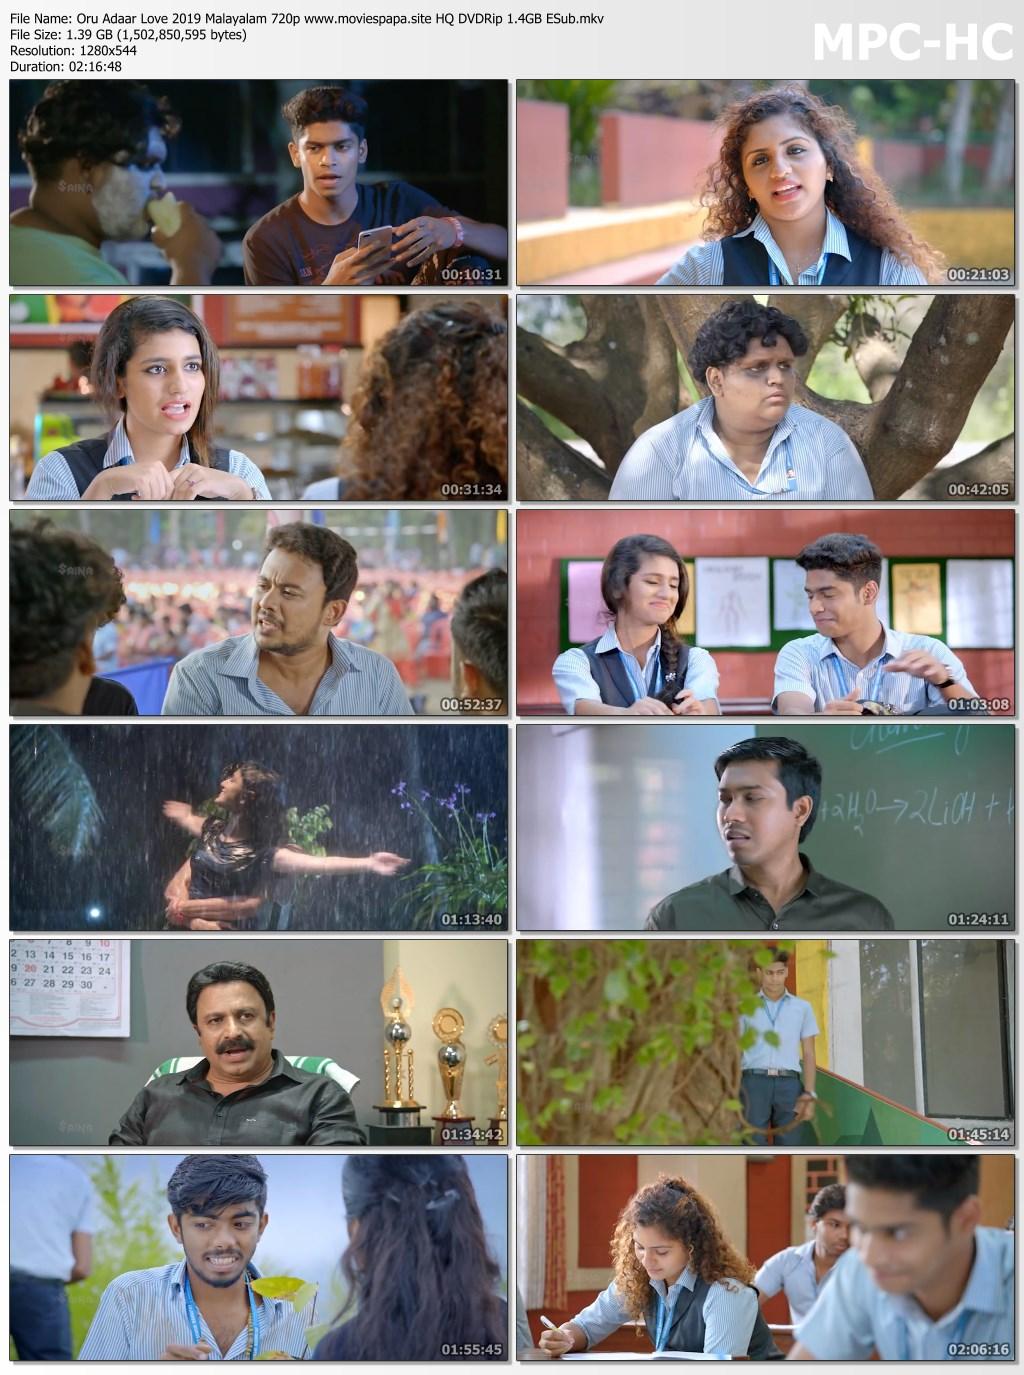 Oru Adaar Love 2019 Malayalam 720P Hq Dvdrip 14Gb Esub -7815